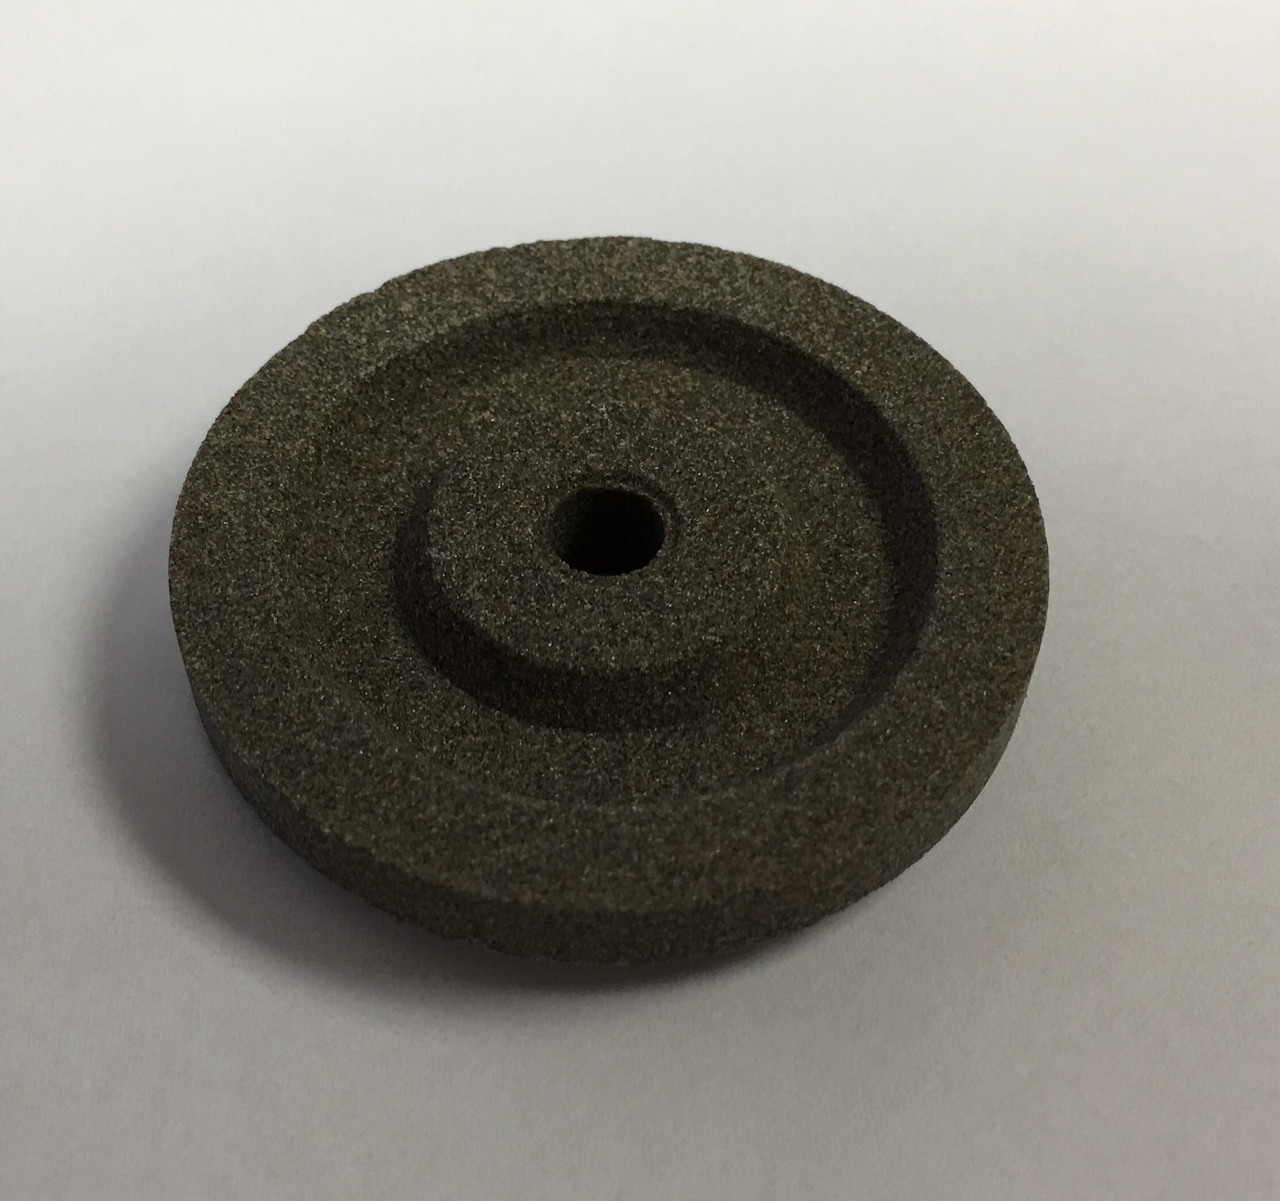 Globe G10,G12,G12A,G14 - Deburing Stone - M092